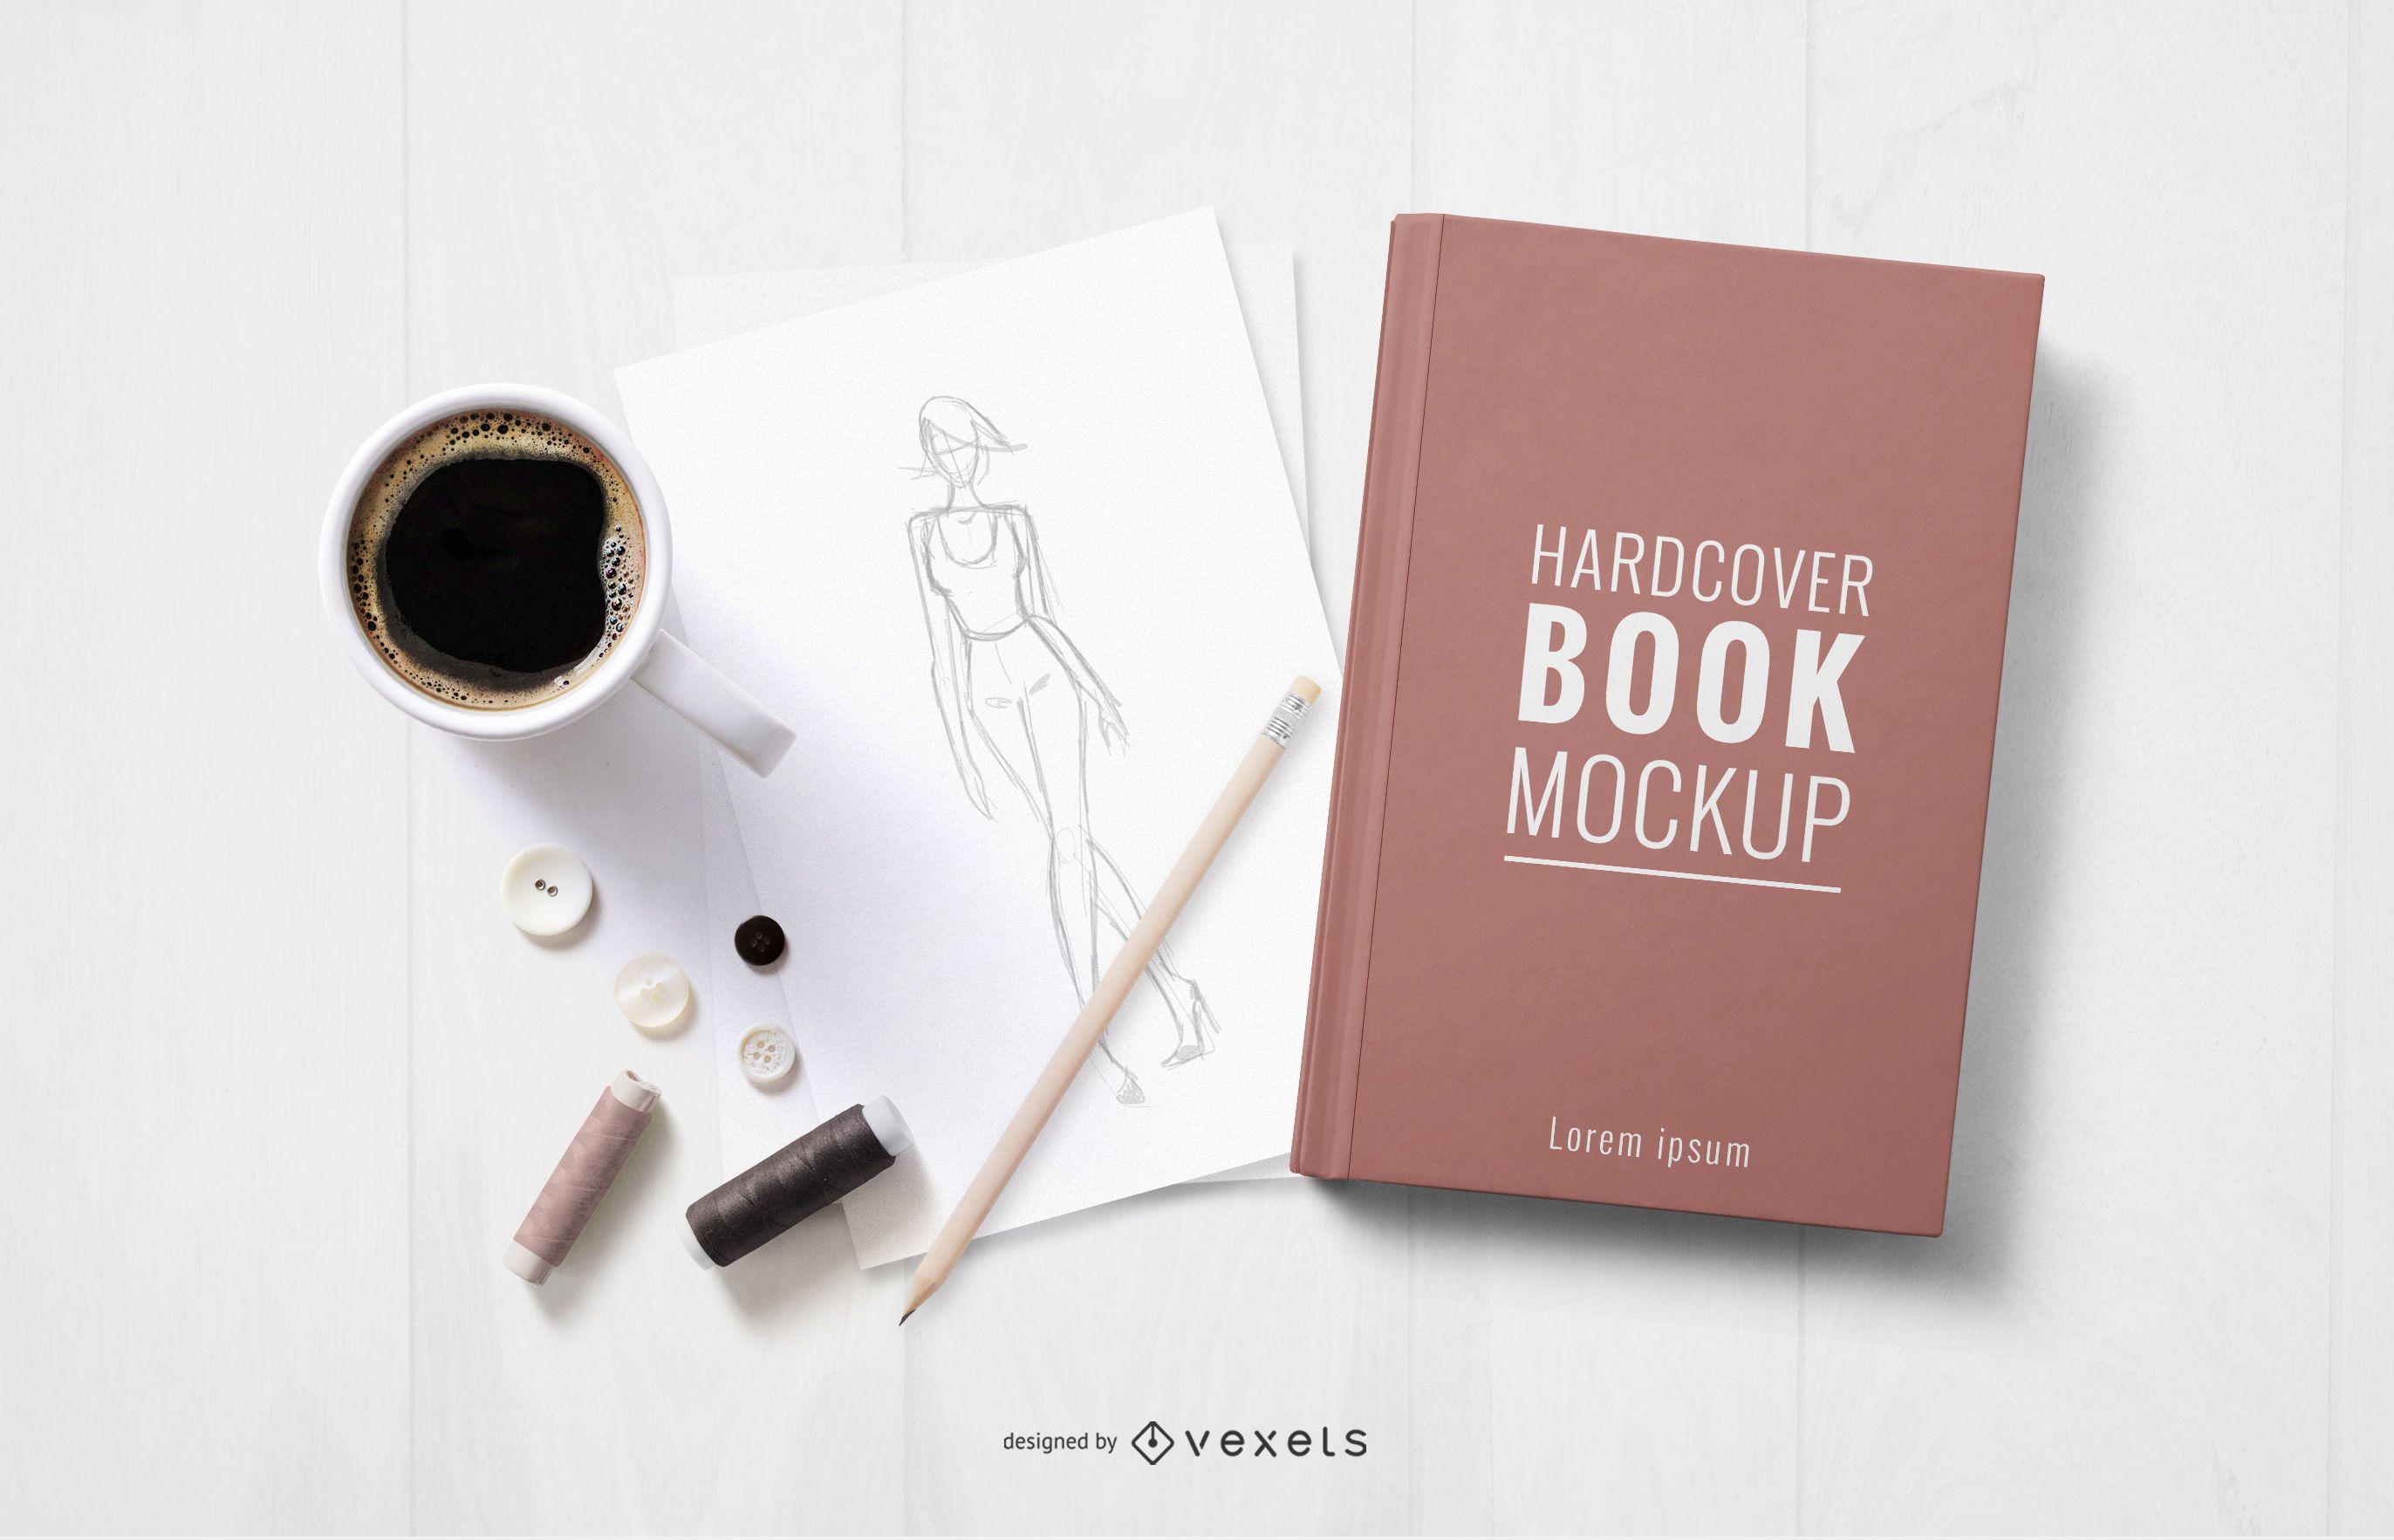 Hardcover Book Mockup Design